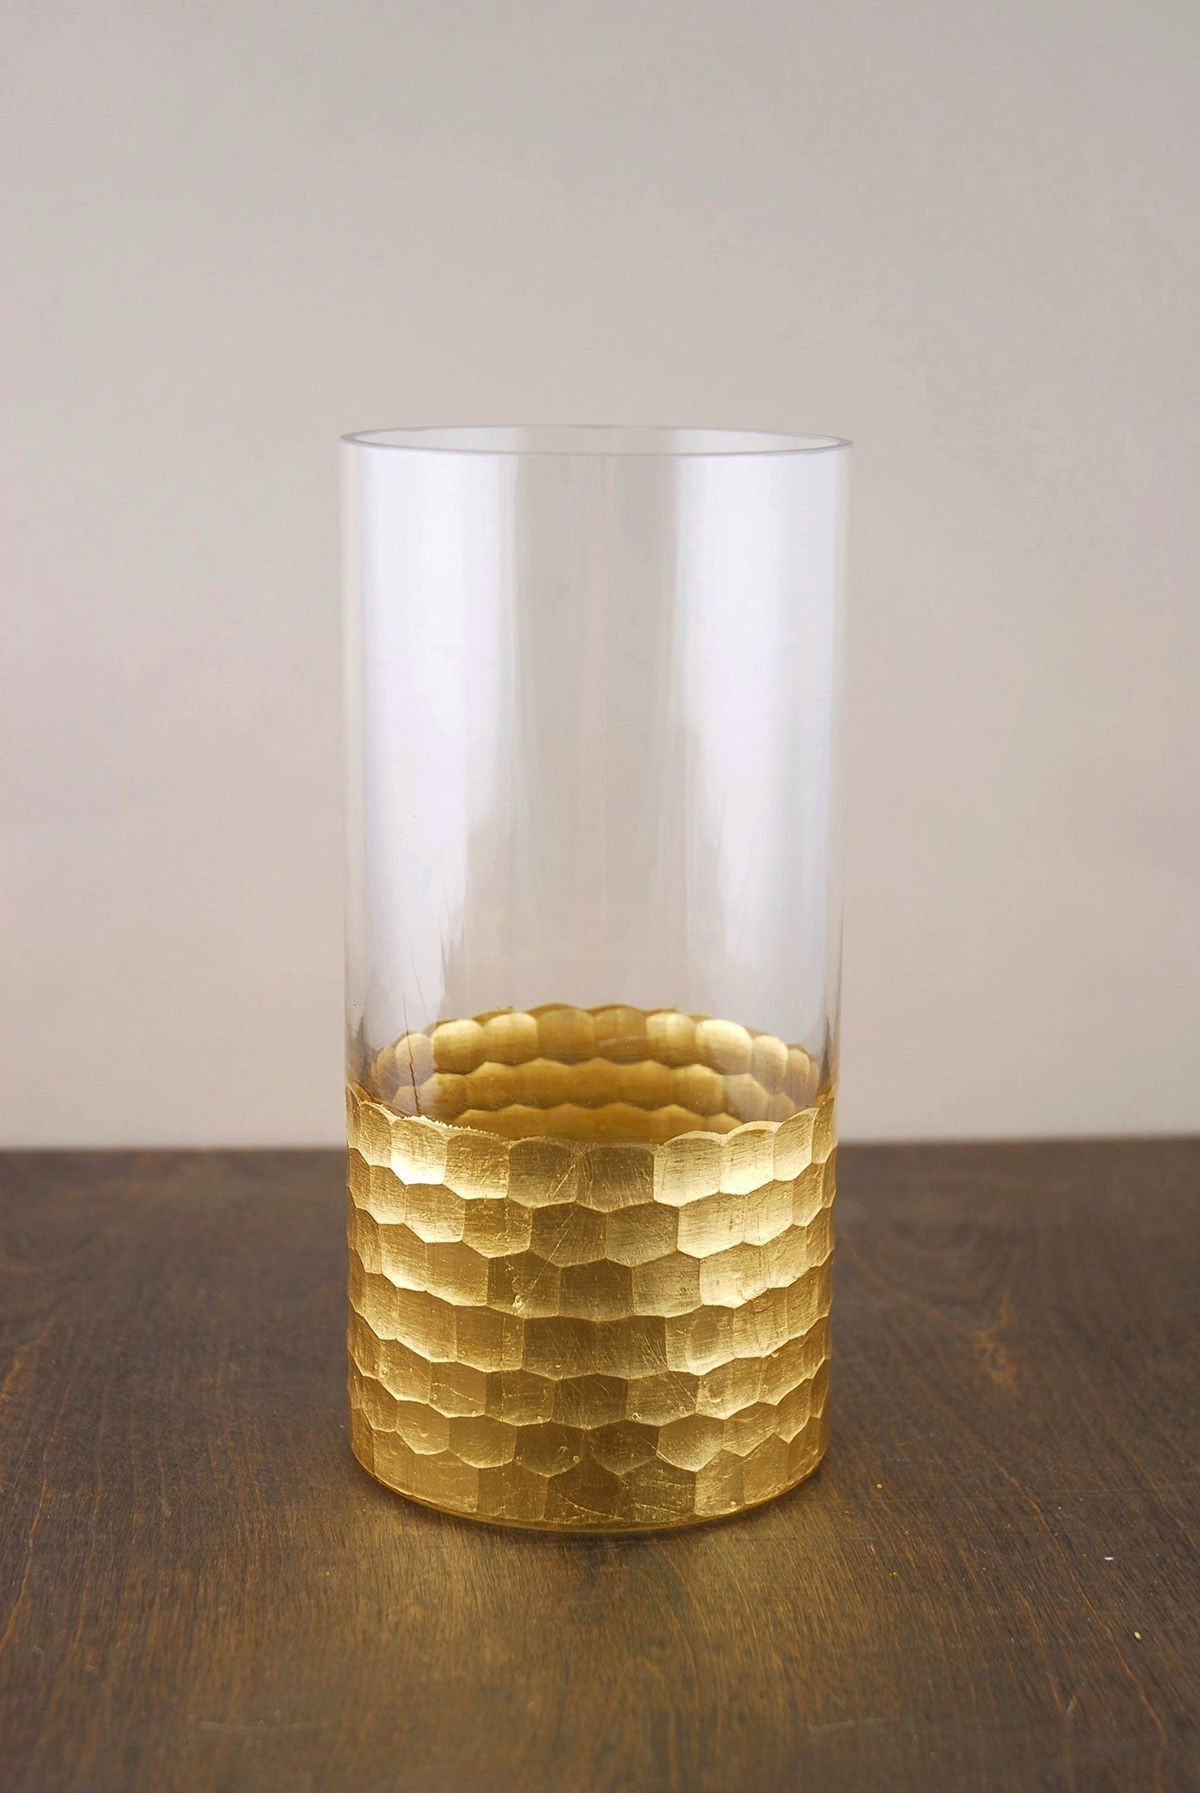 cylinder candle vase set of 3 of gold mercury glass vases inspirational gold cylinder vases within gold mercury glass vases inspirational gold cylinder vases collection silver and gold mercury glass mosaic